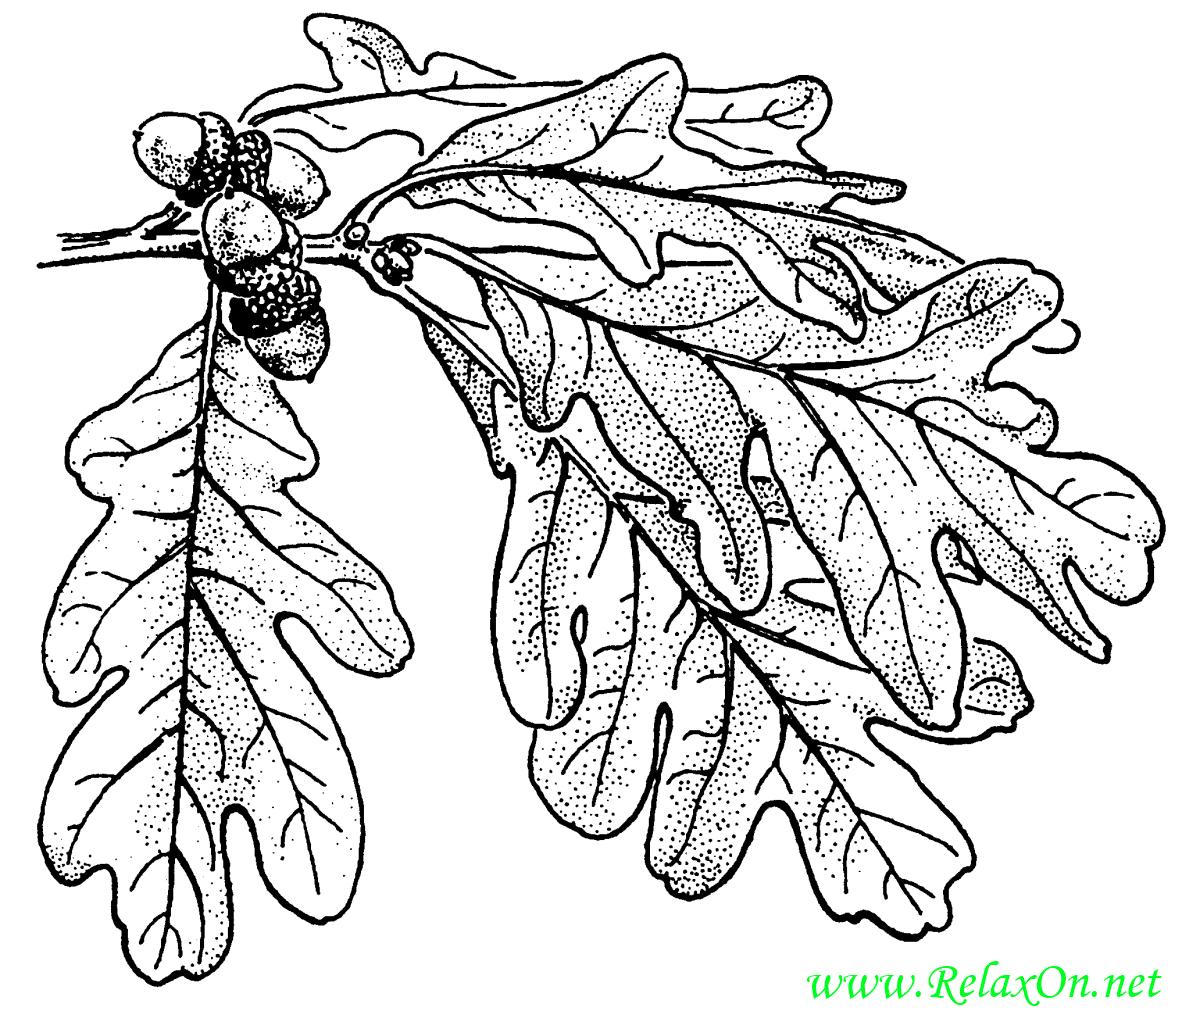 Трафарет листьев дуба-1